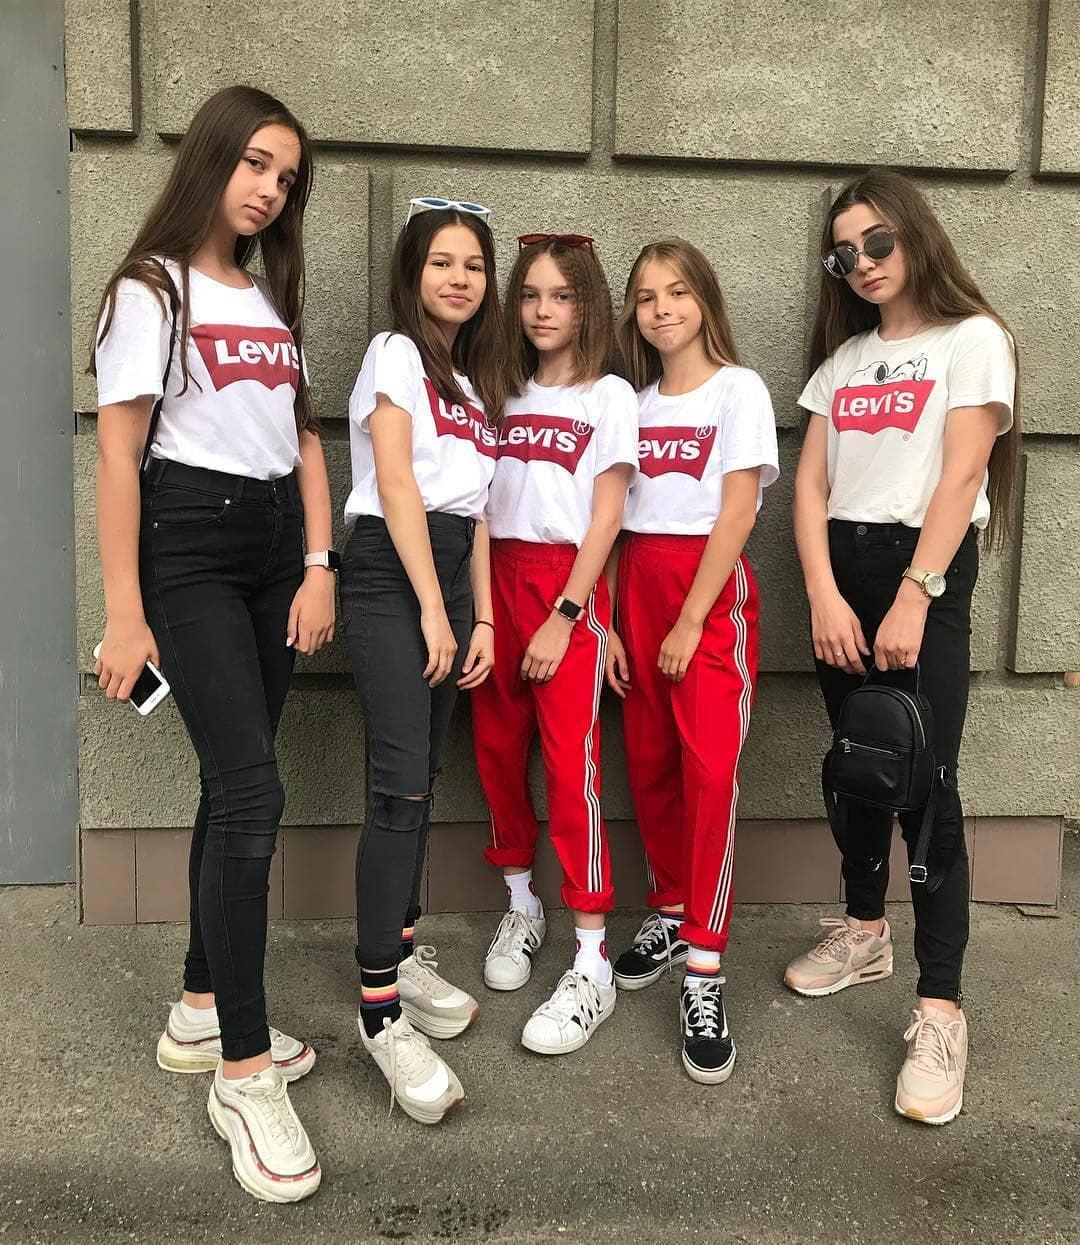 white levis t-shirt de Les Bourgeoises sur vikasolodchennko